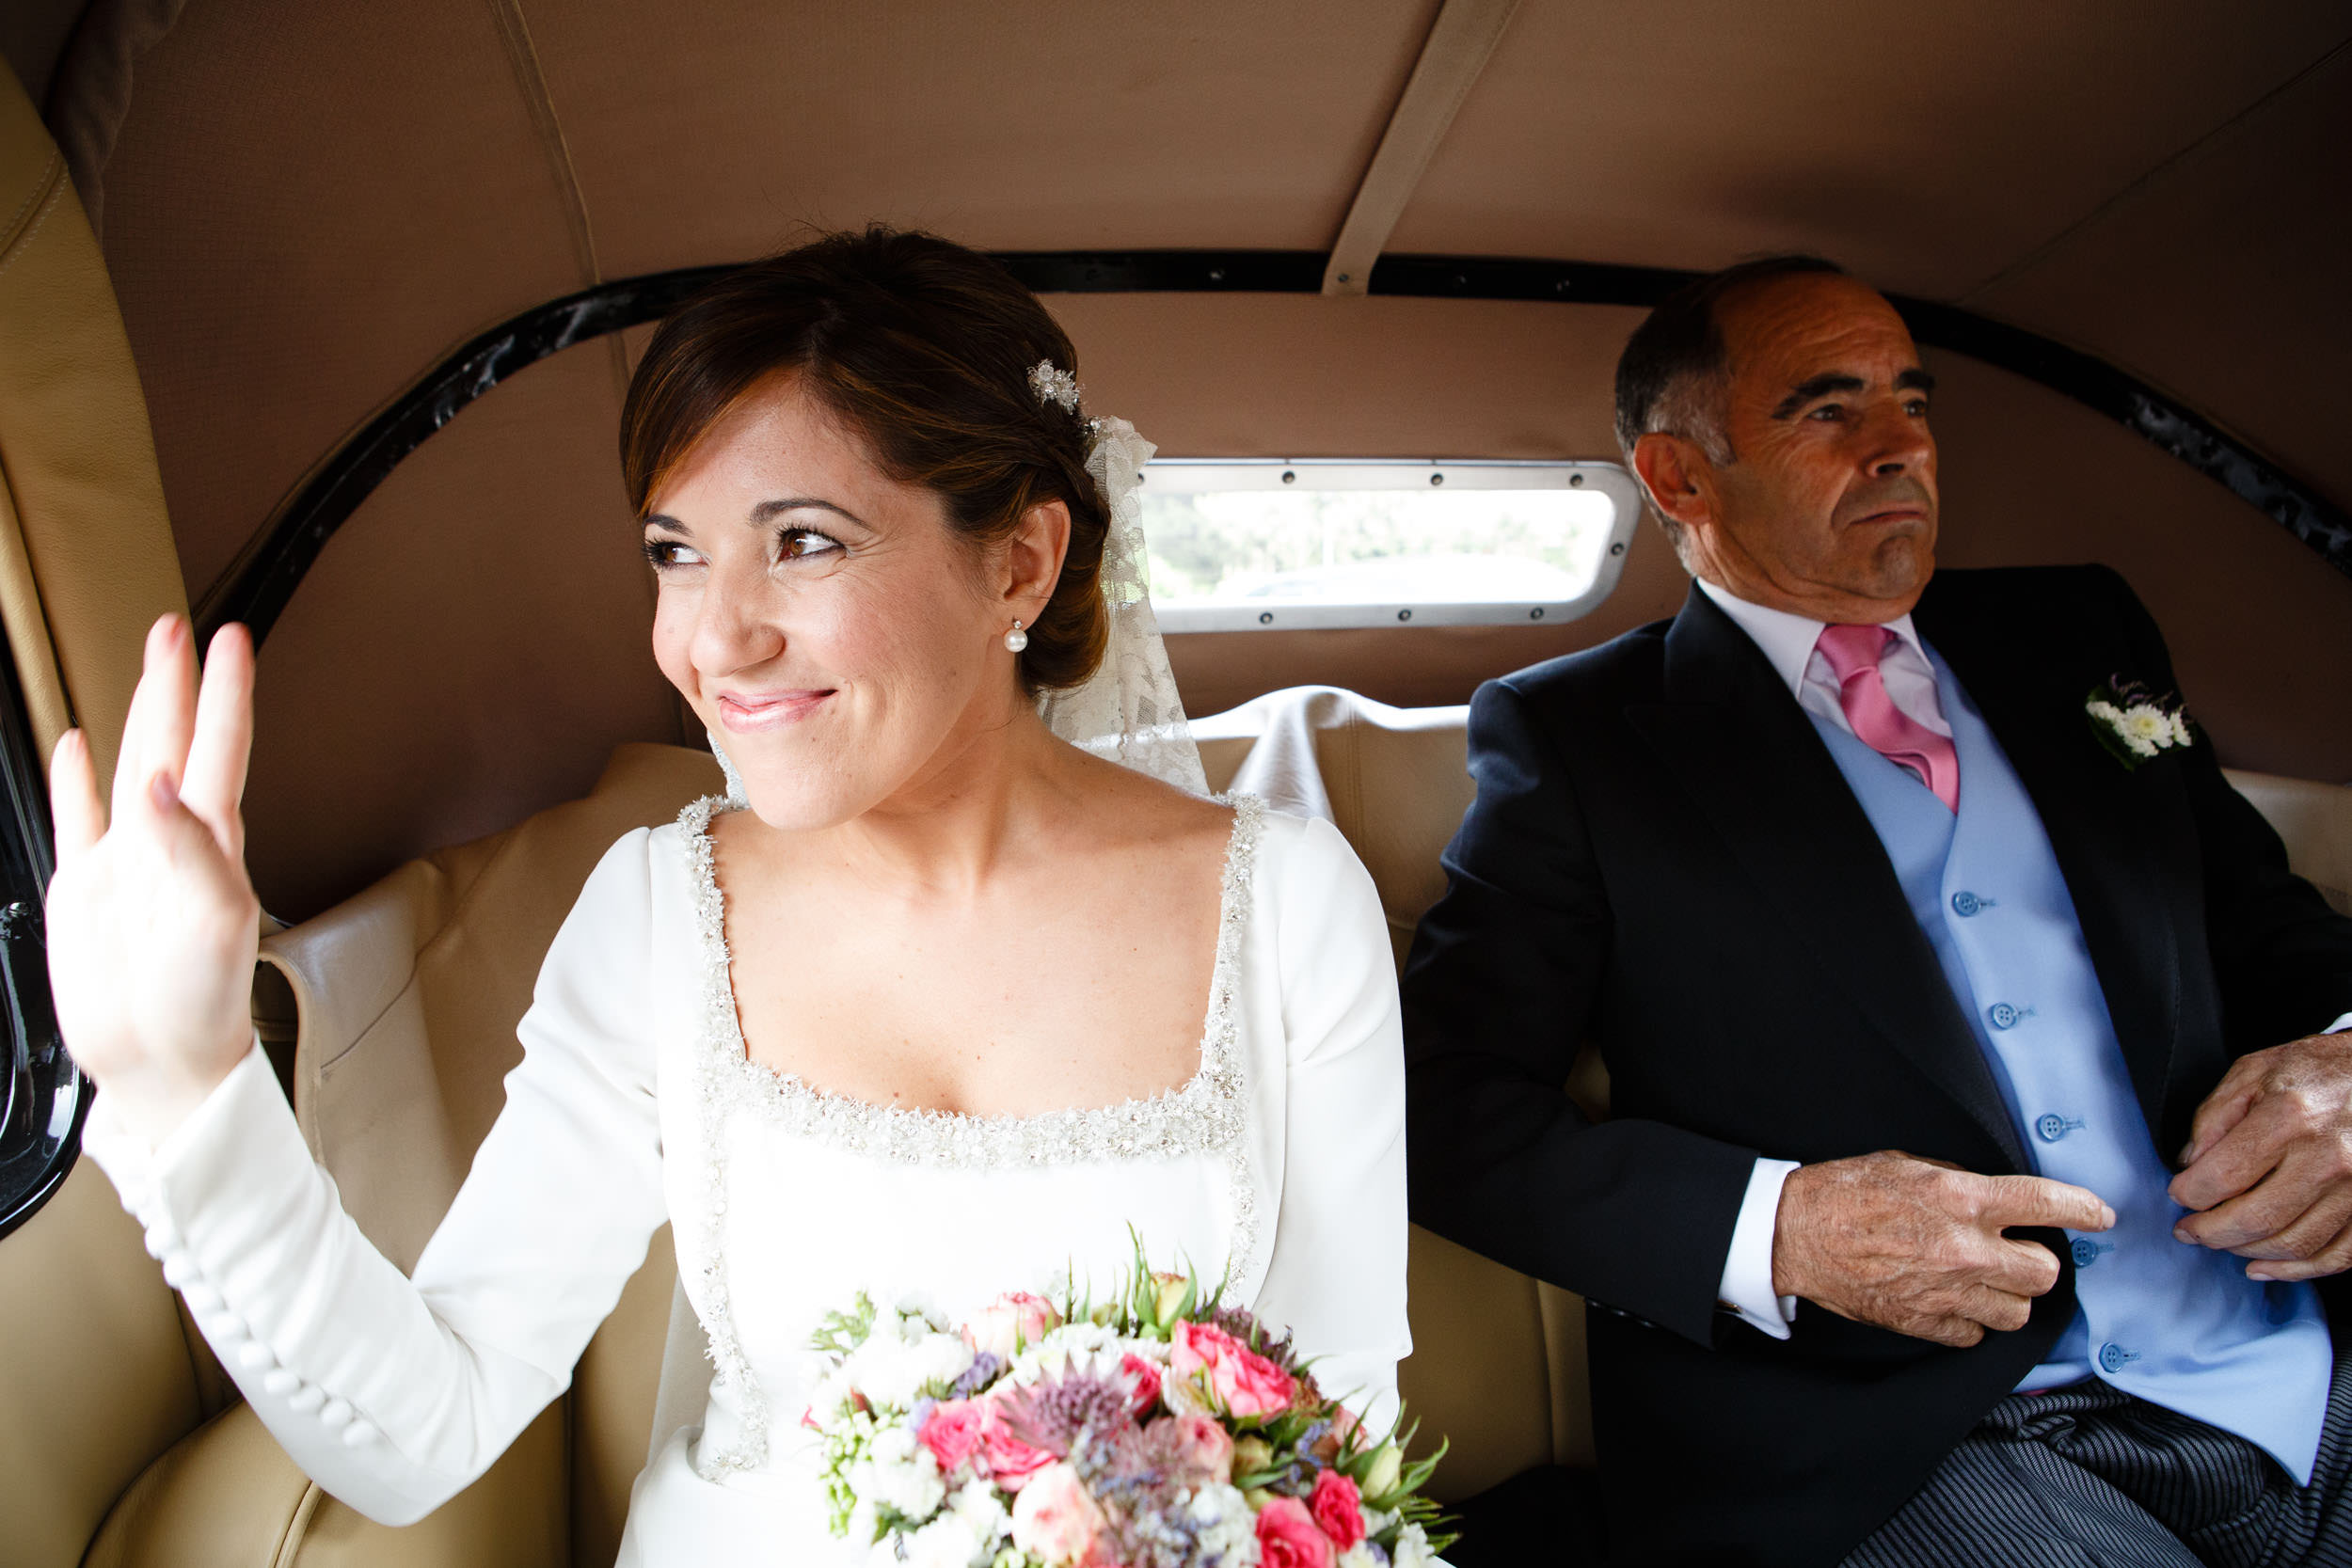 Wedding Photographer La Rioja Basque Country Spain - James Sturcke - sturcke.org_018.jpg